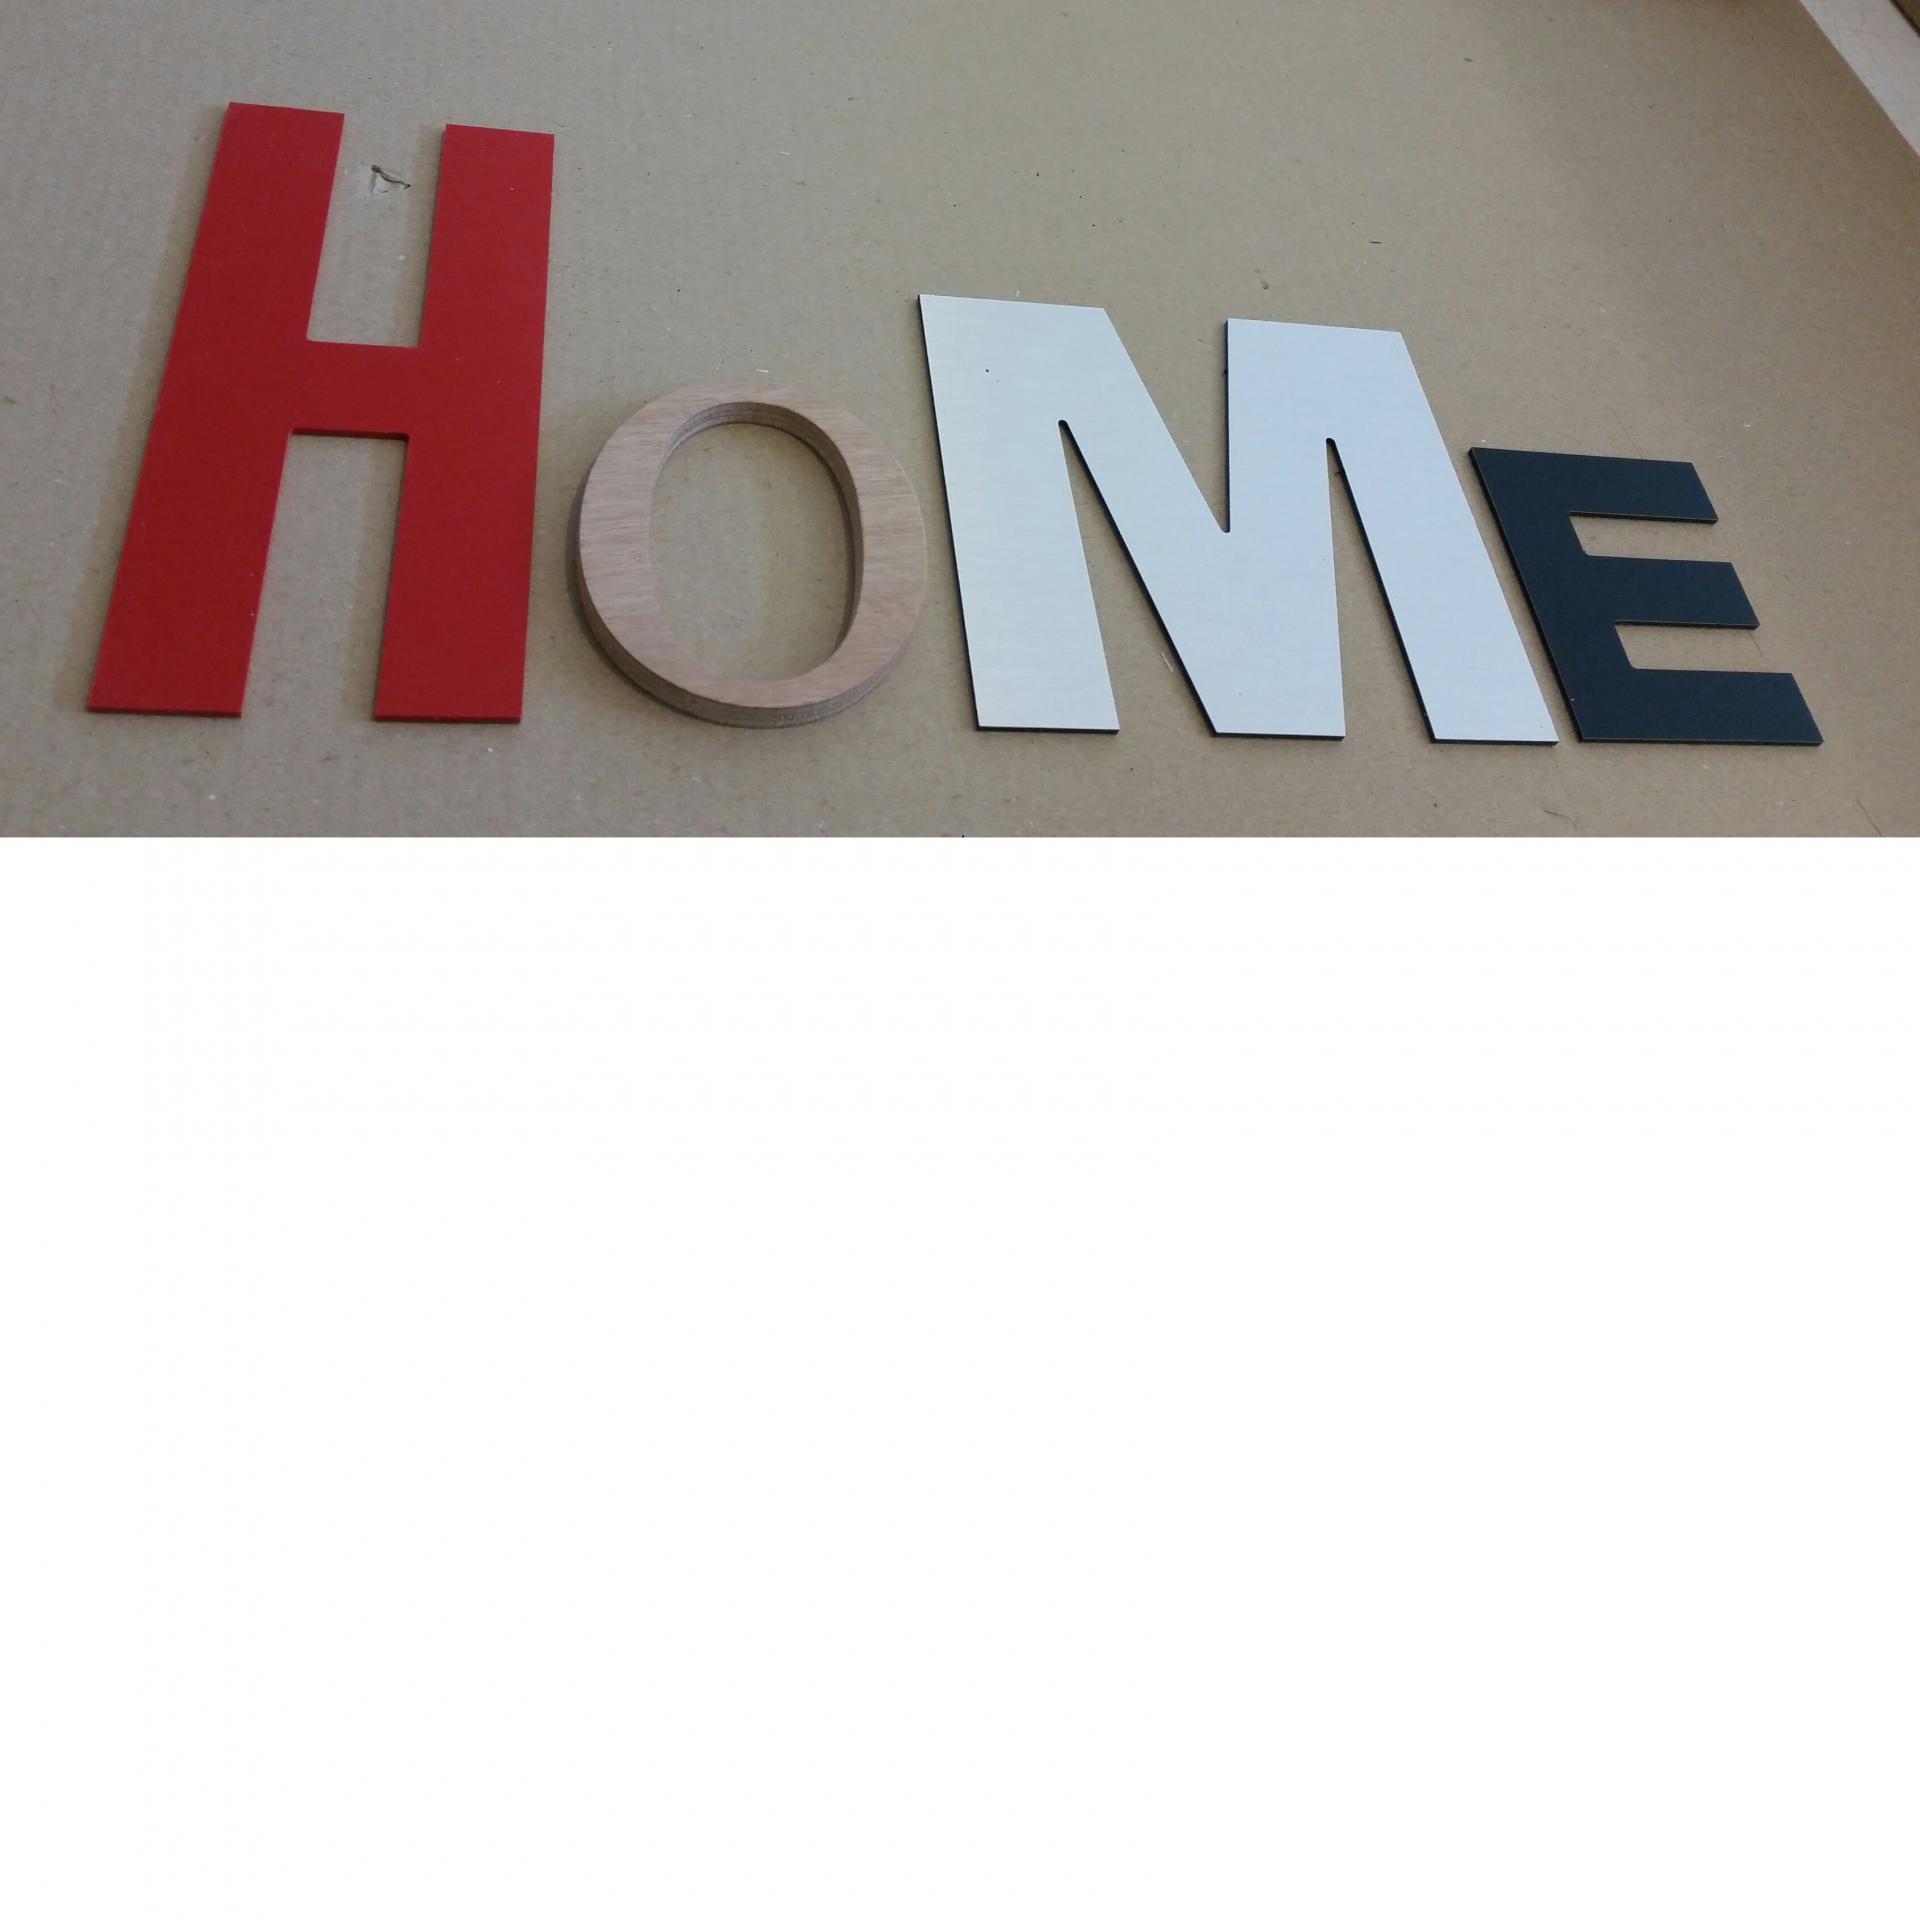 Lettre decorative home lot 9